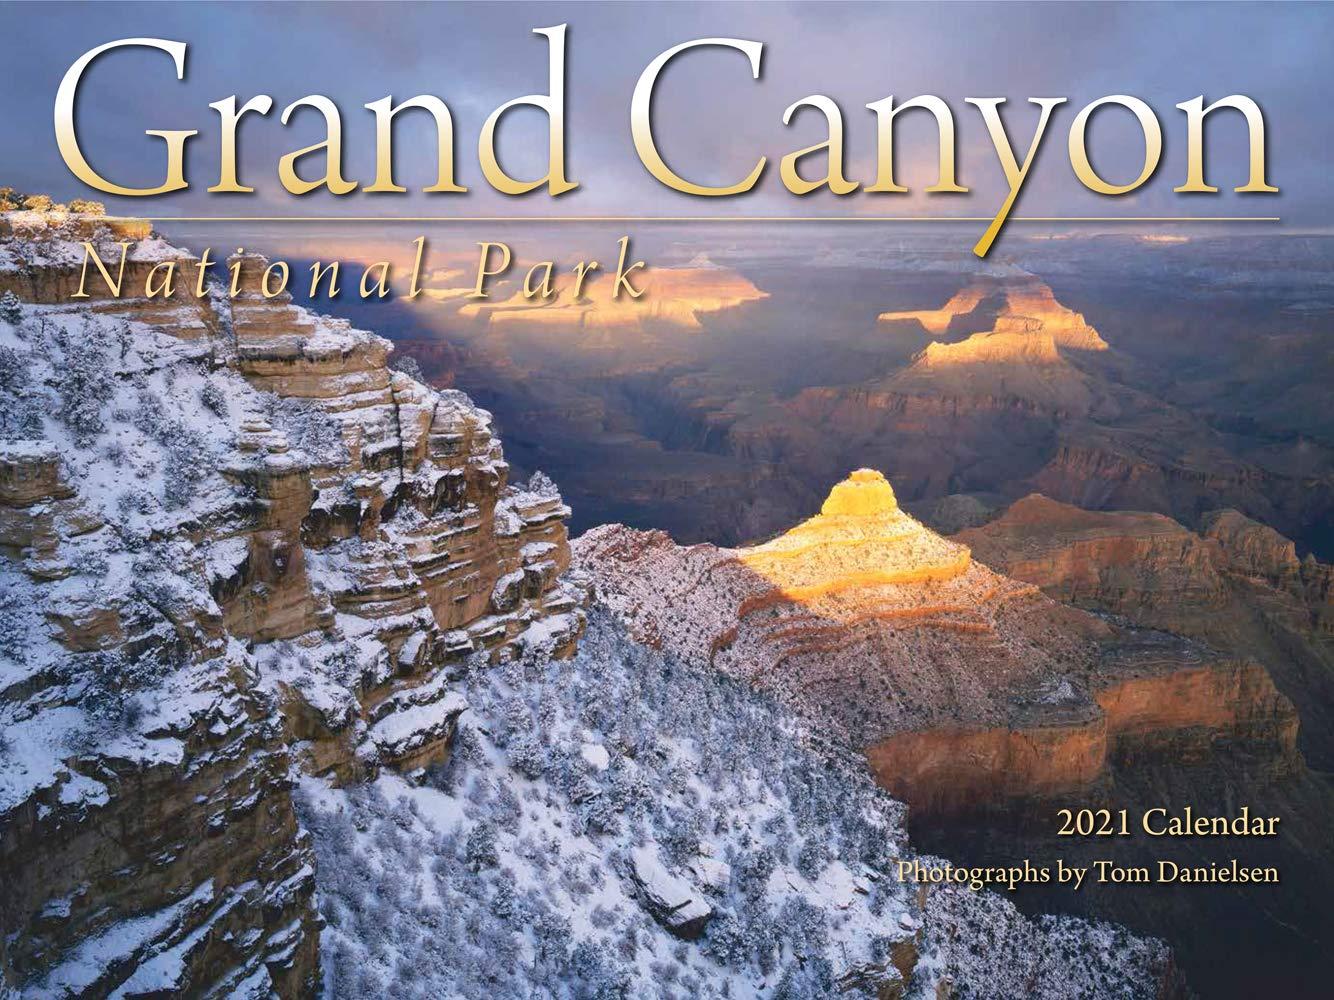 Gcu Academic Calendar 2022 2023.2022 Calendar Grand Canyon University Calendar 2021 22